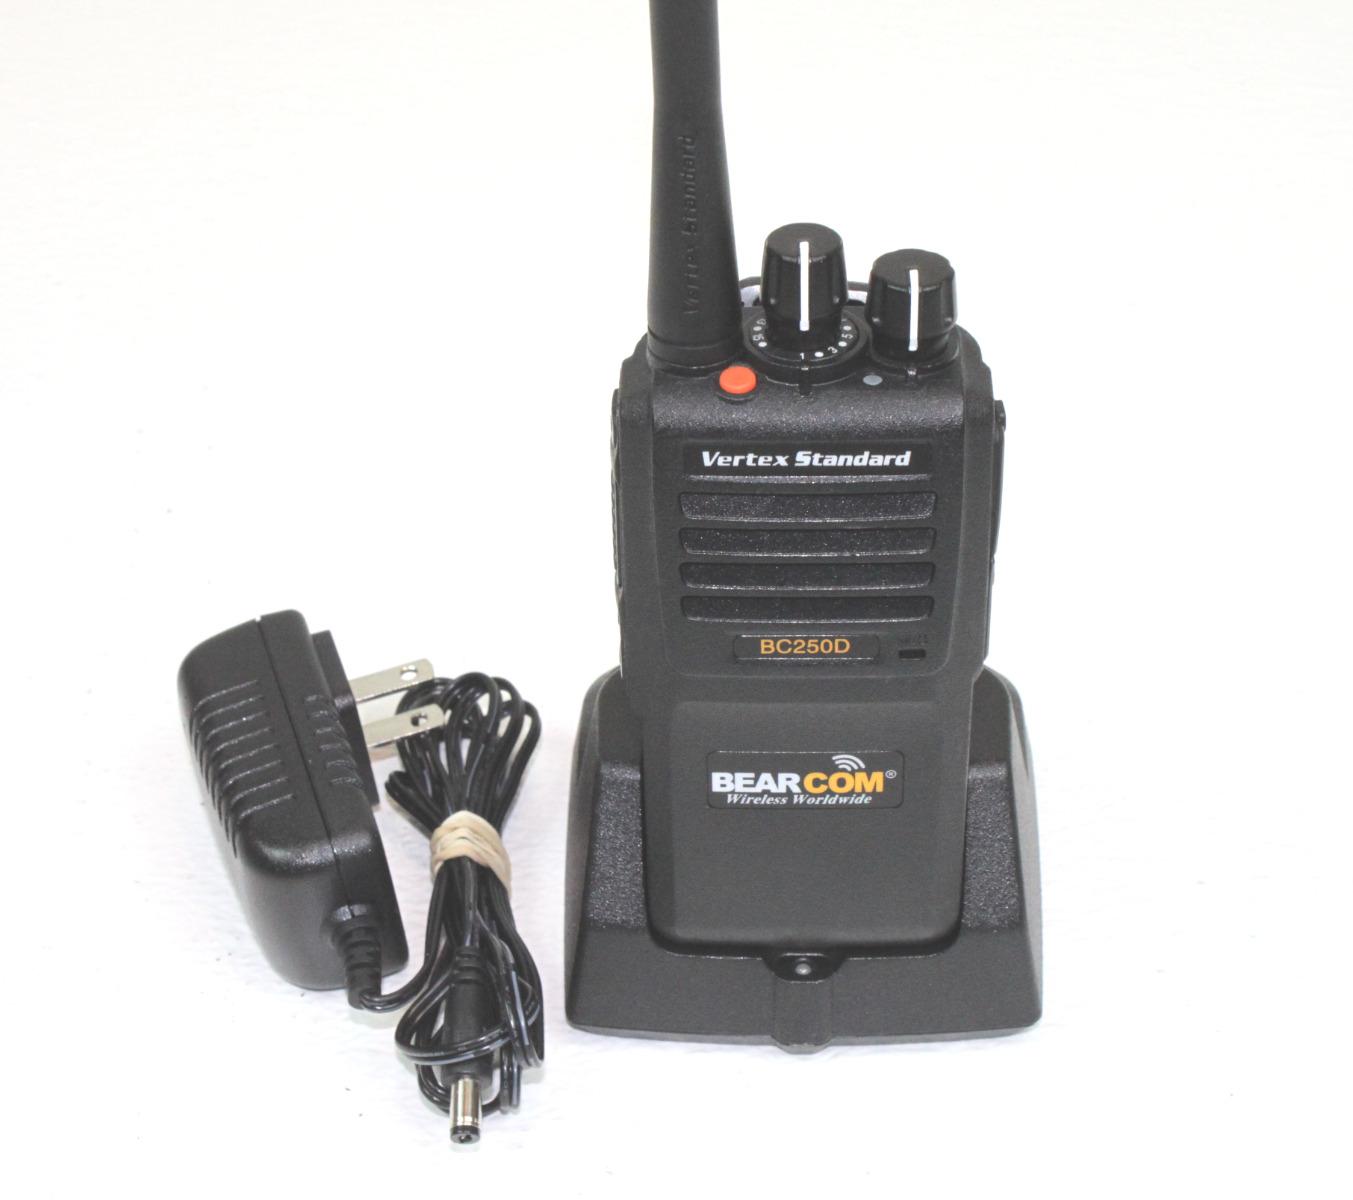 Bearcom BC250D UHF Digital Portable Two-Way Radio